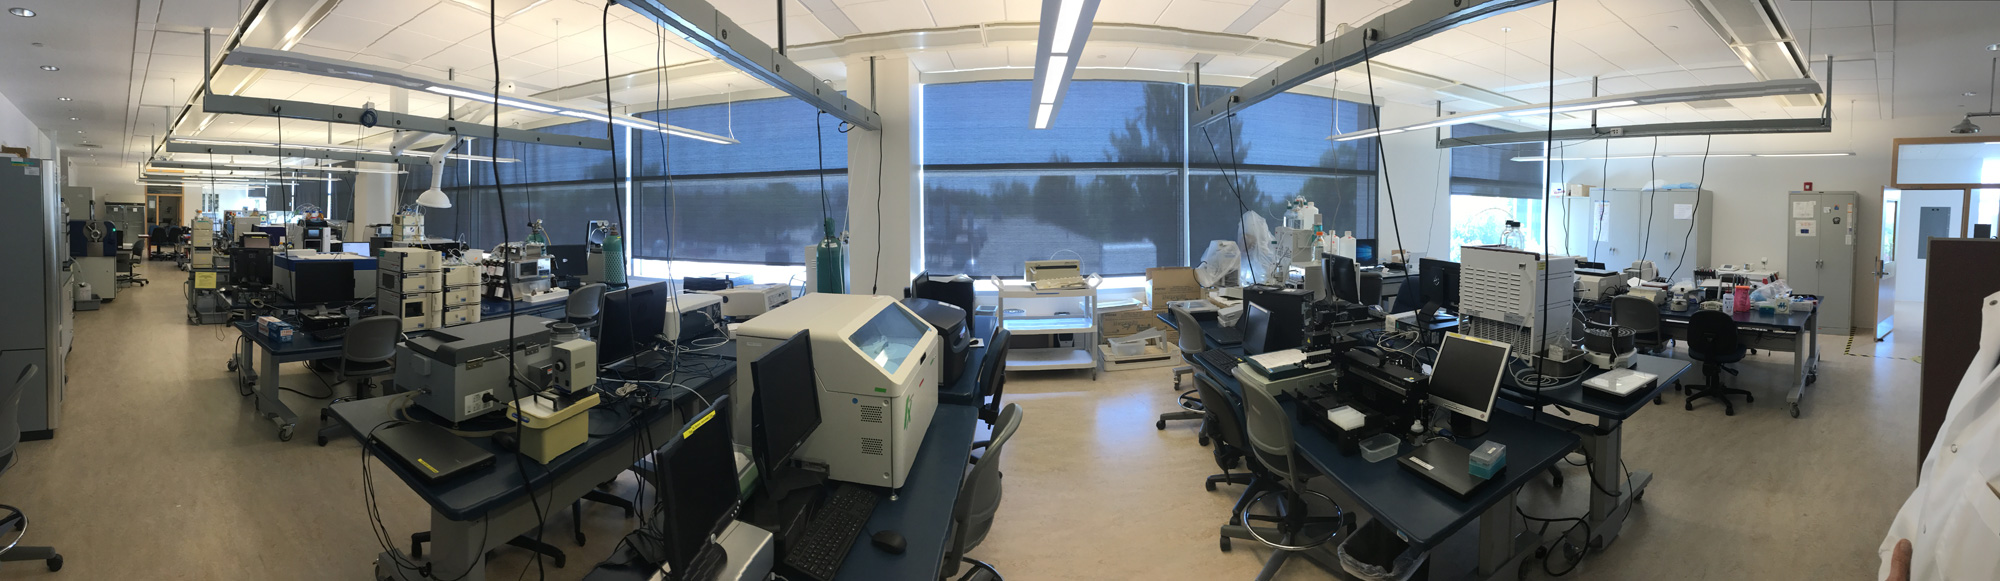 RI-INBRE Centralized Research Core Facility, URI College of Pharmacy